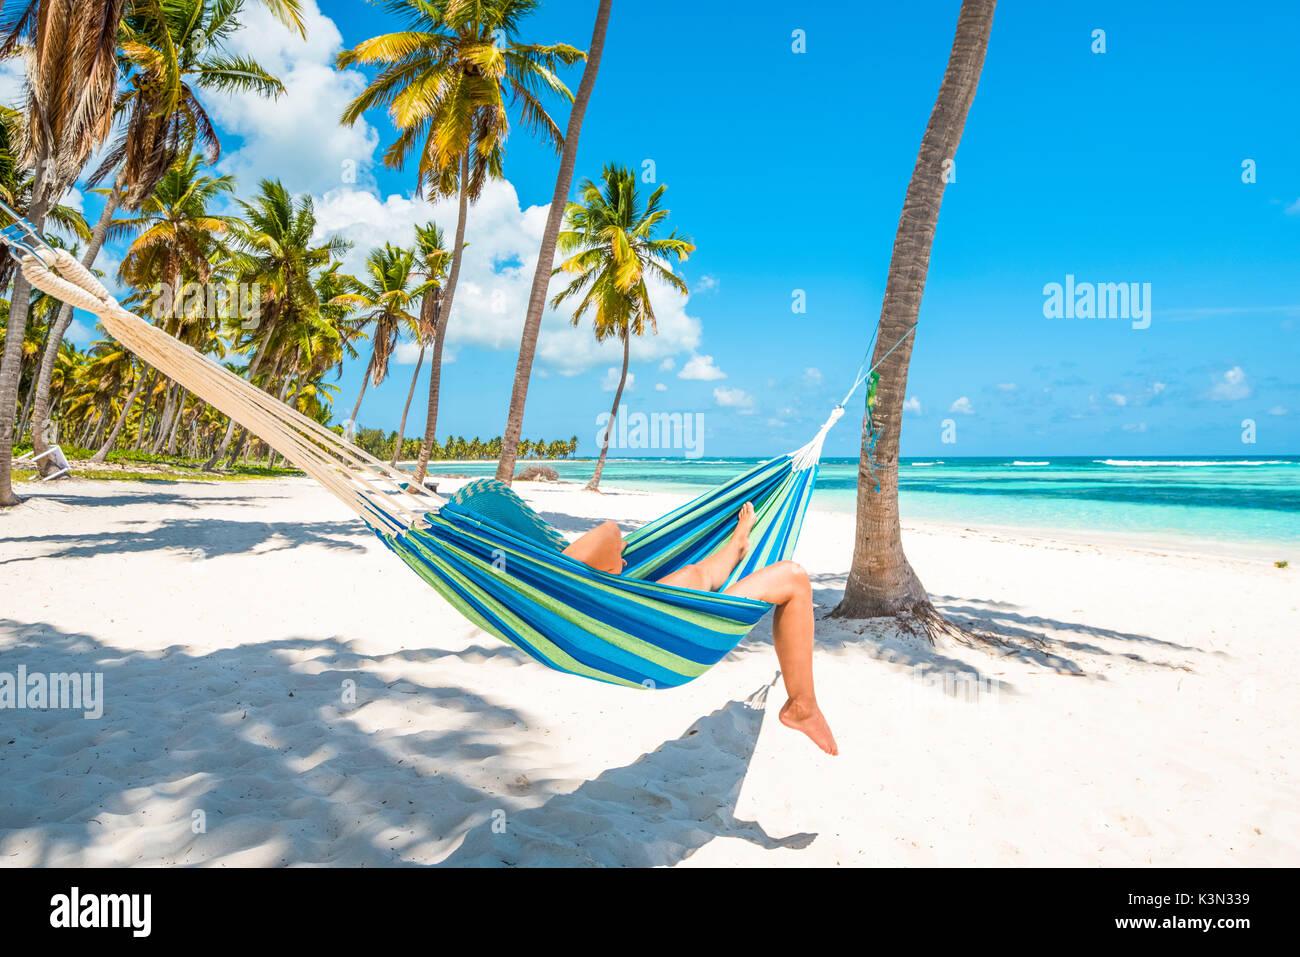 Canto de la Playa, Saona Island, East National Park (Parque Nacional del Este), Dominican Republic, Caribbean Sea. Woman relaxing on a hammock on the beach (MR). - Stock Image